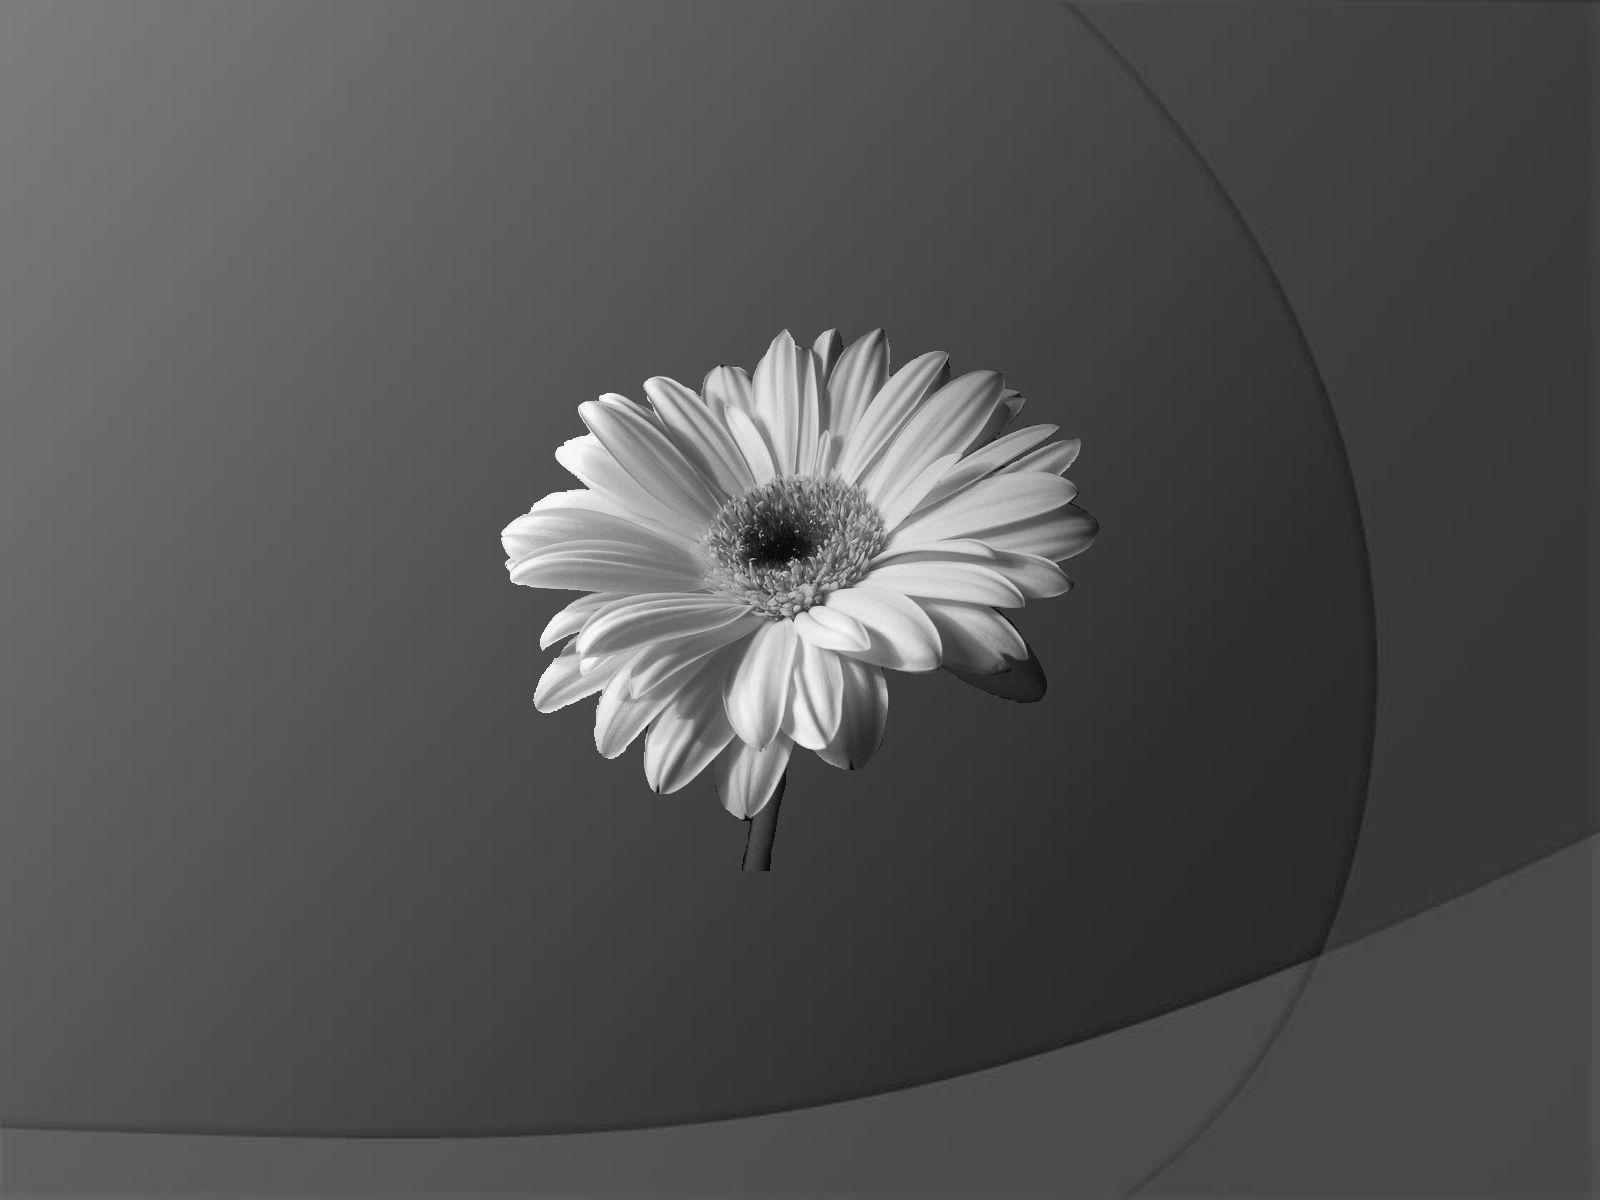 Widescreen desktop wallpaper dark flower wallpapersafari - Flower wallpaper black ...